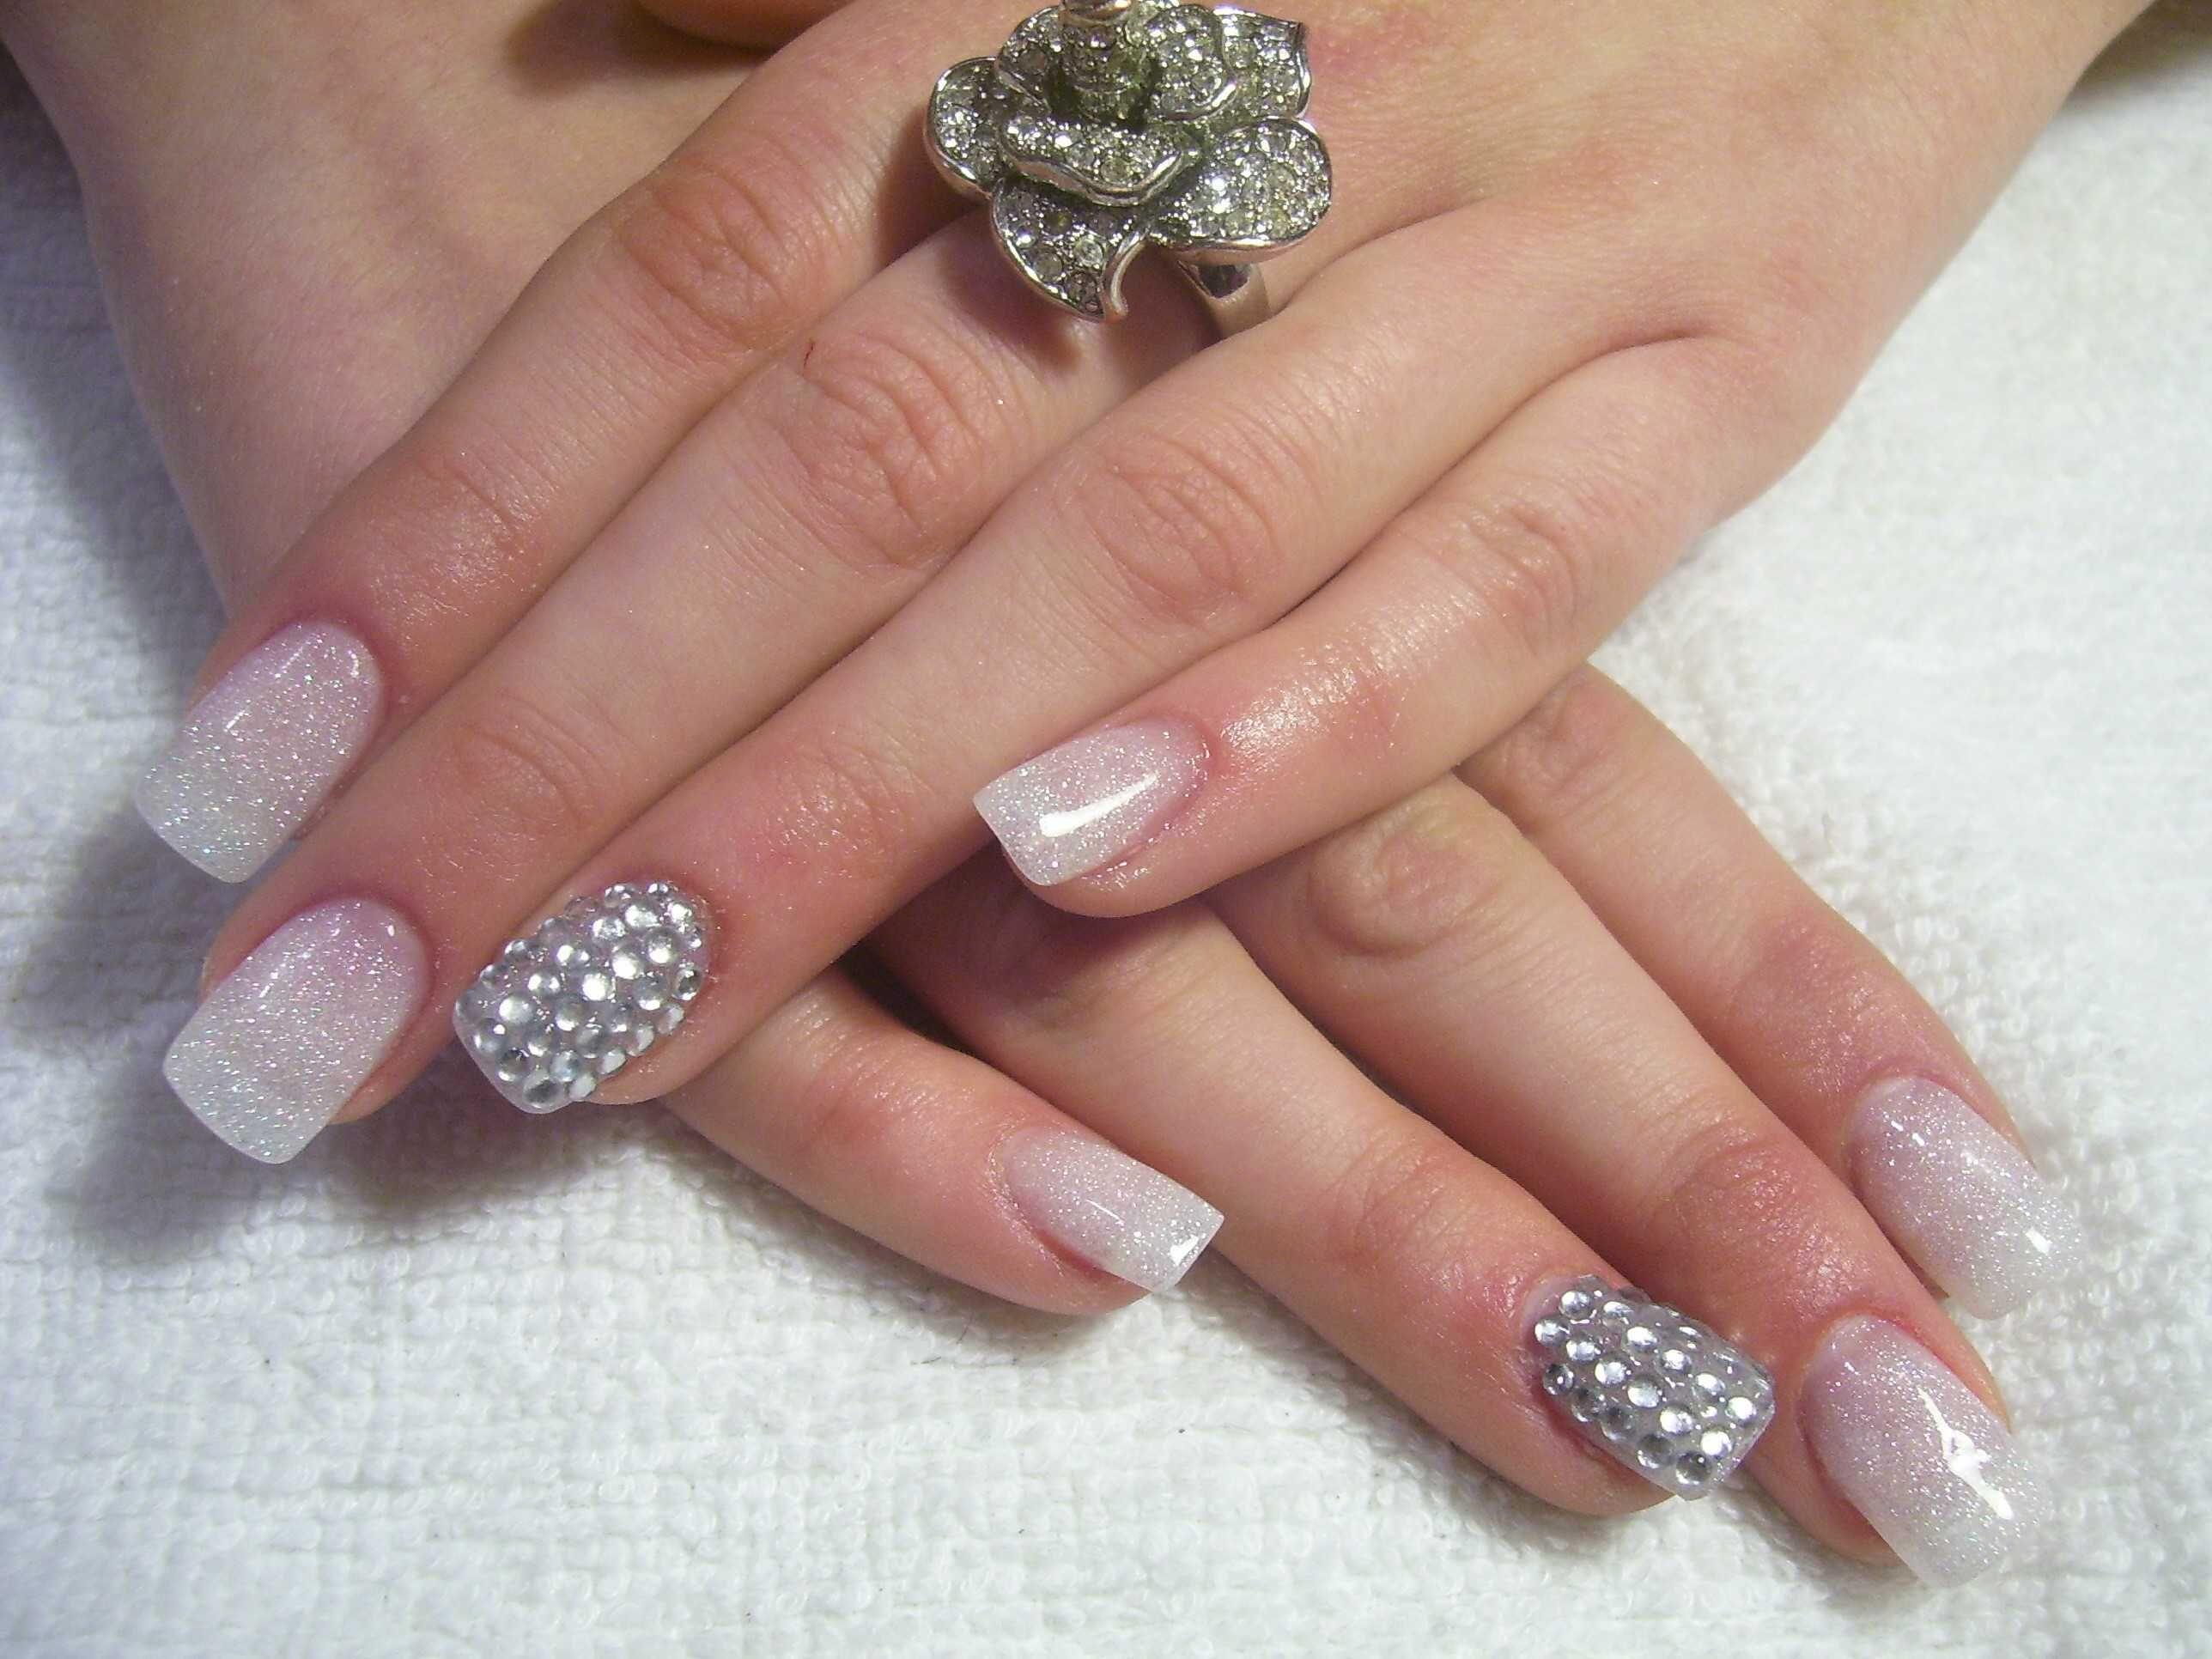 Shiny Diamond Nails | Nails! | Pinterest | Diamond nails, Diamond ...